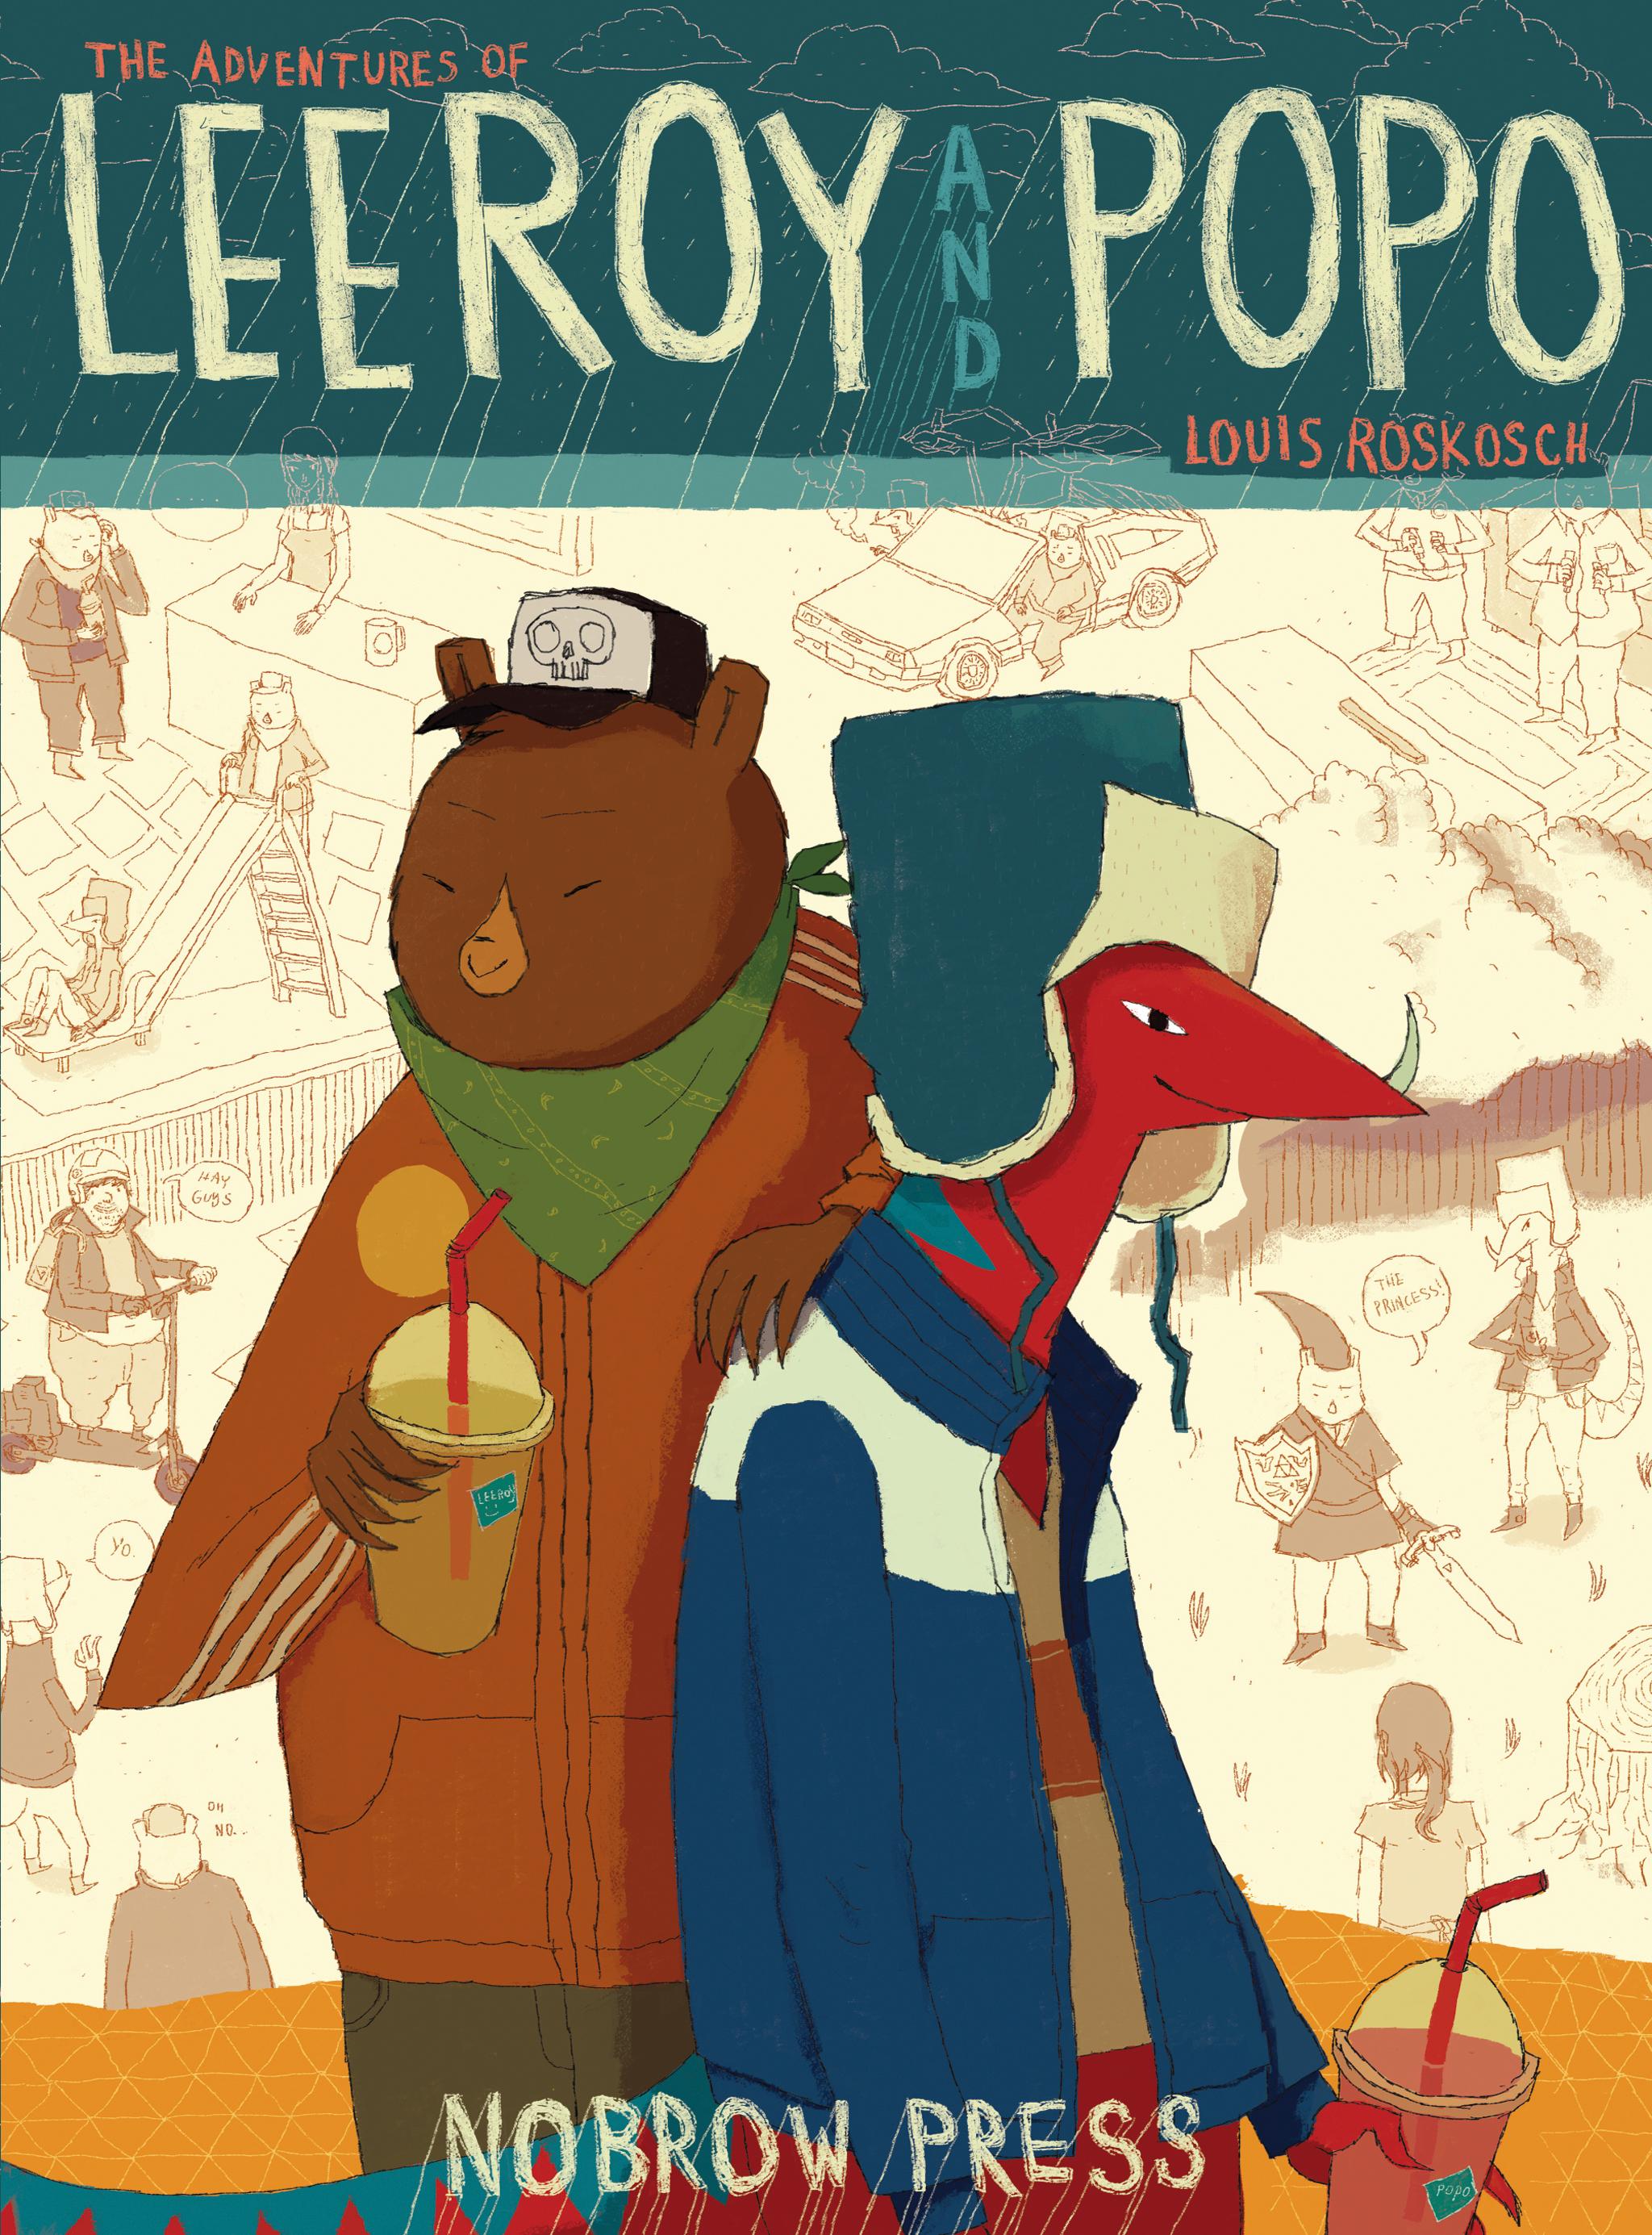 Leeroy and Popo